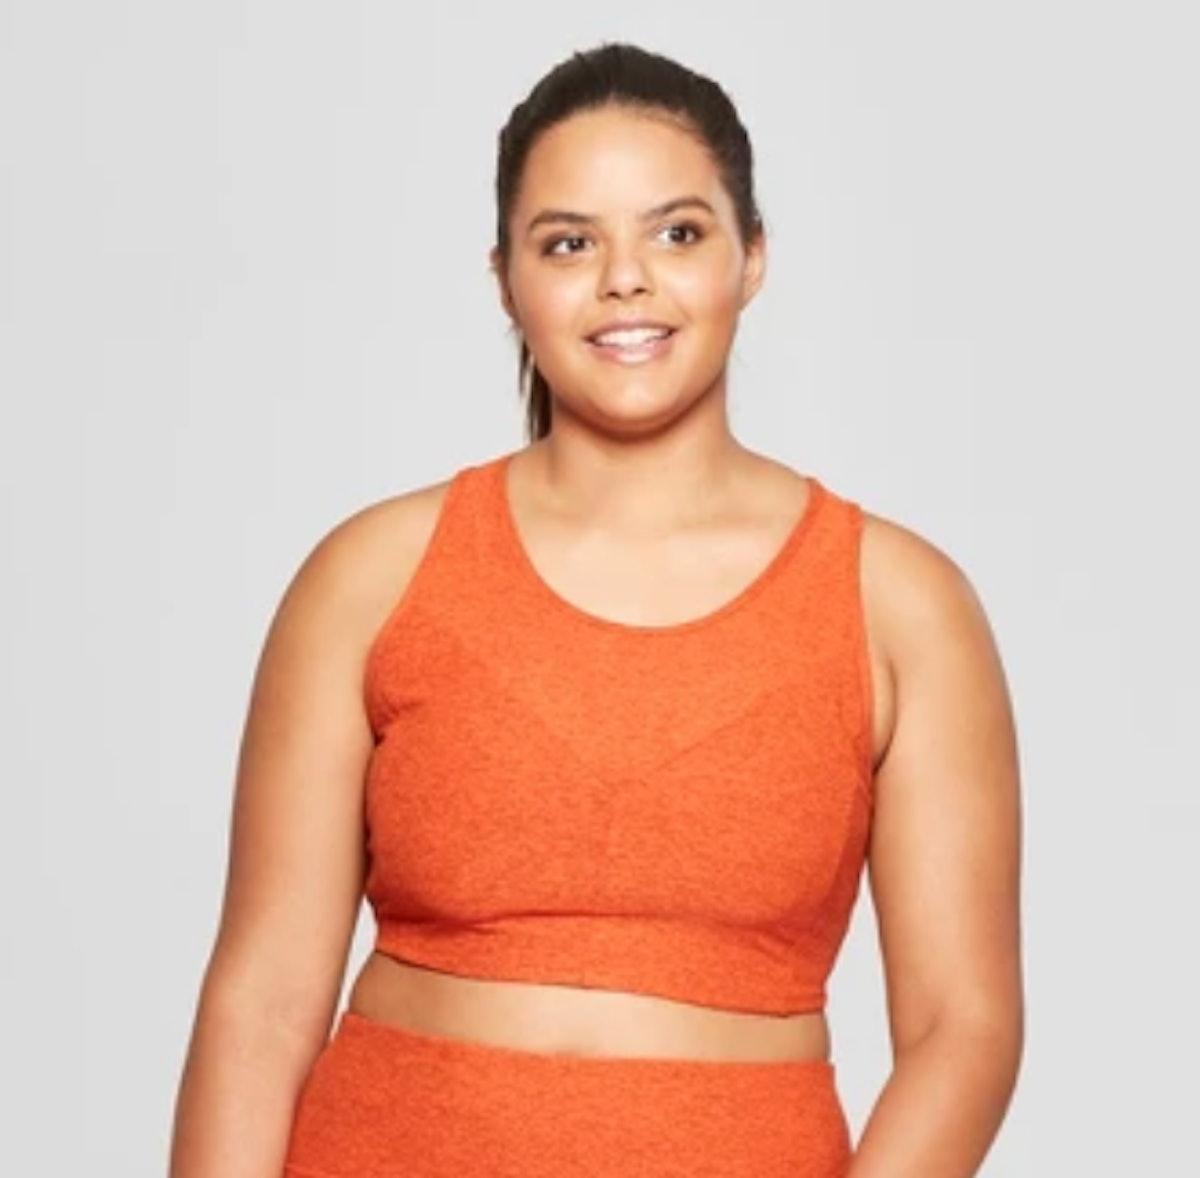 Women's Plus Longline Sports Bra - JoyLab